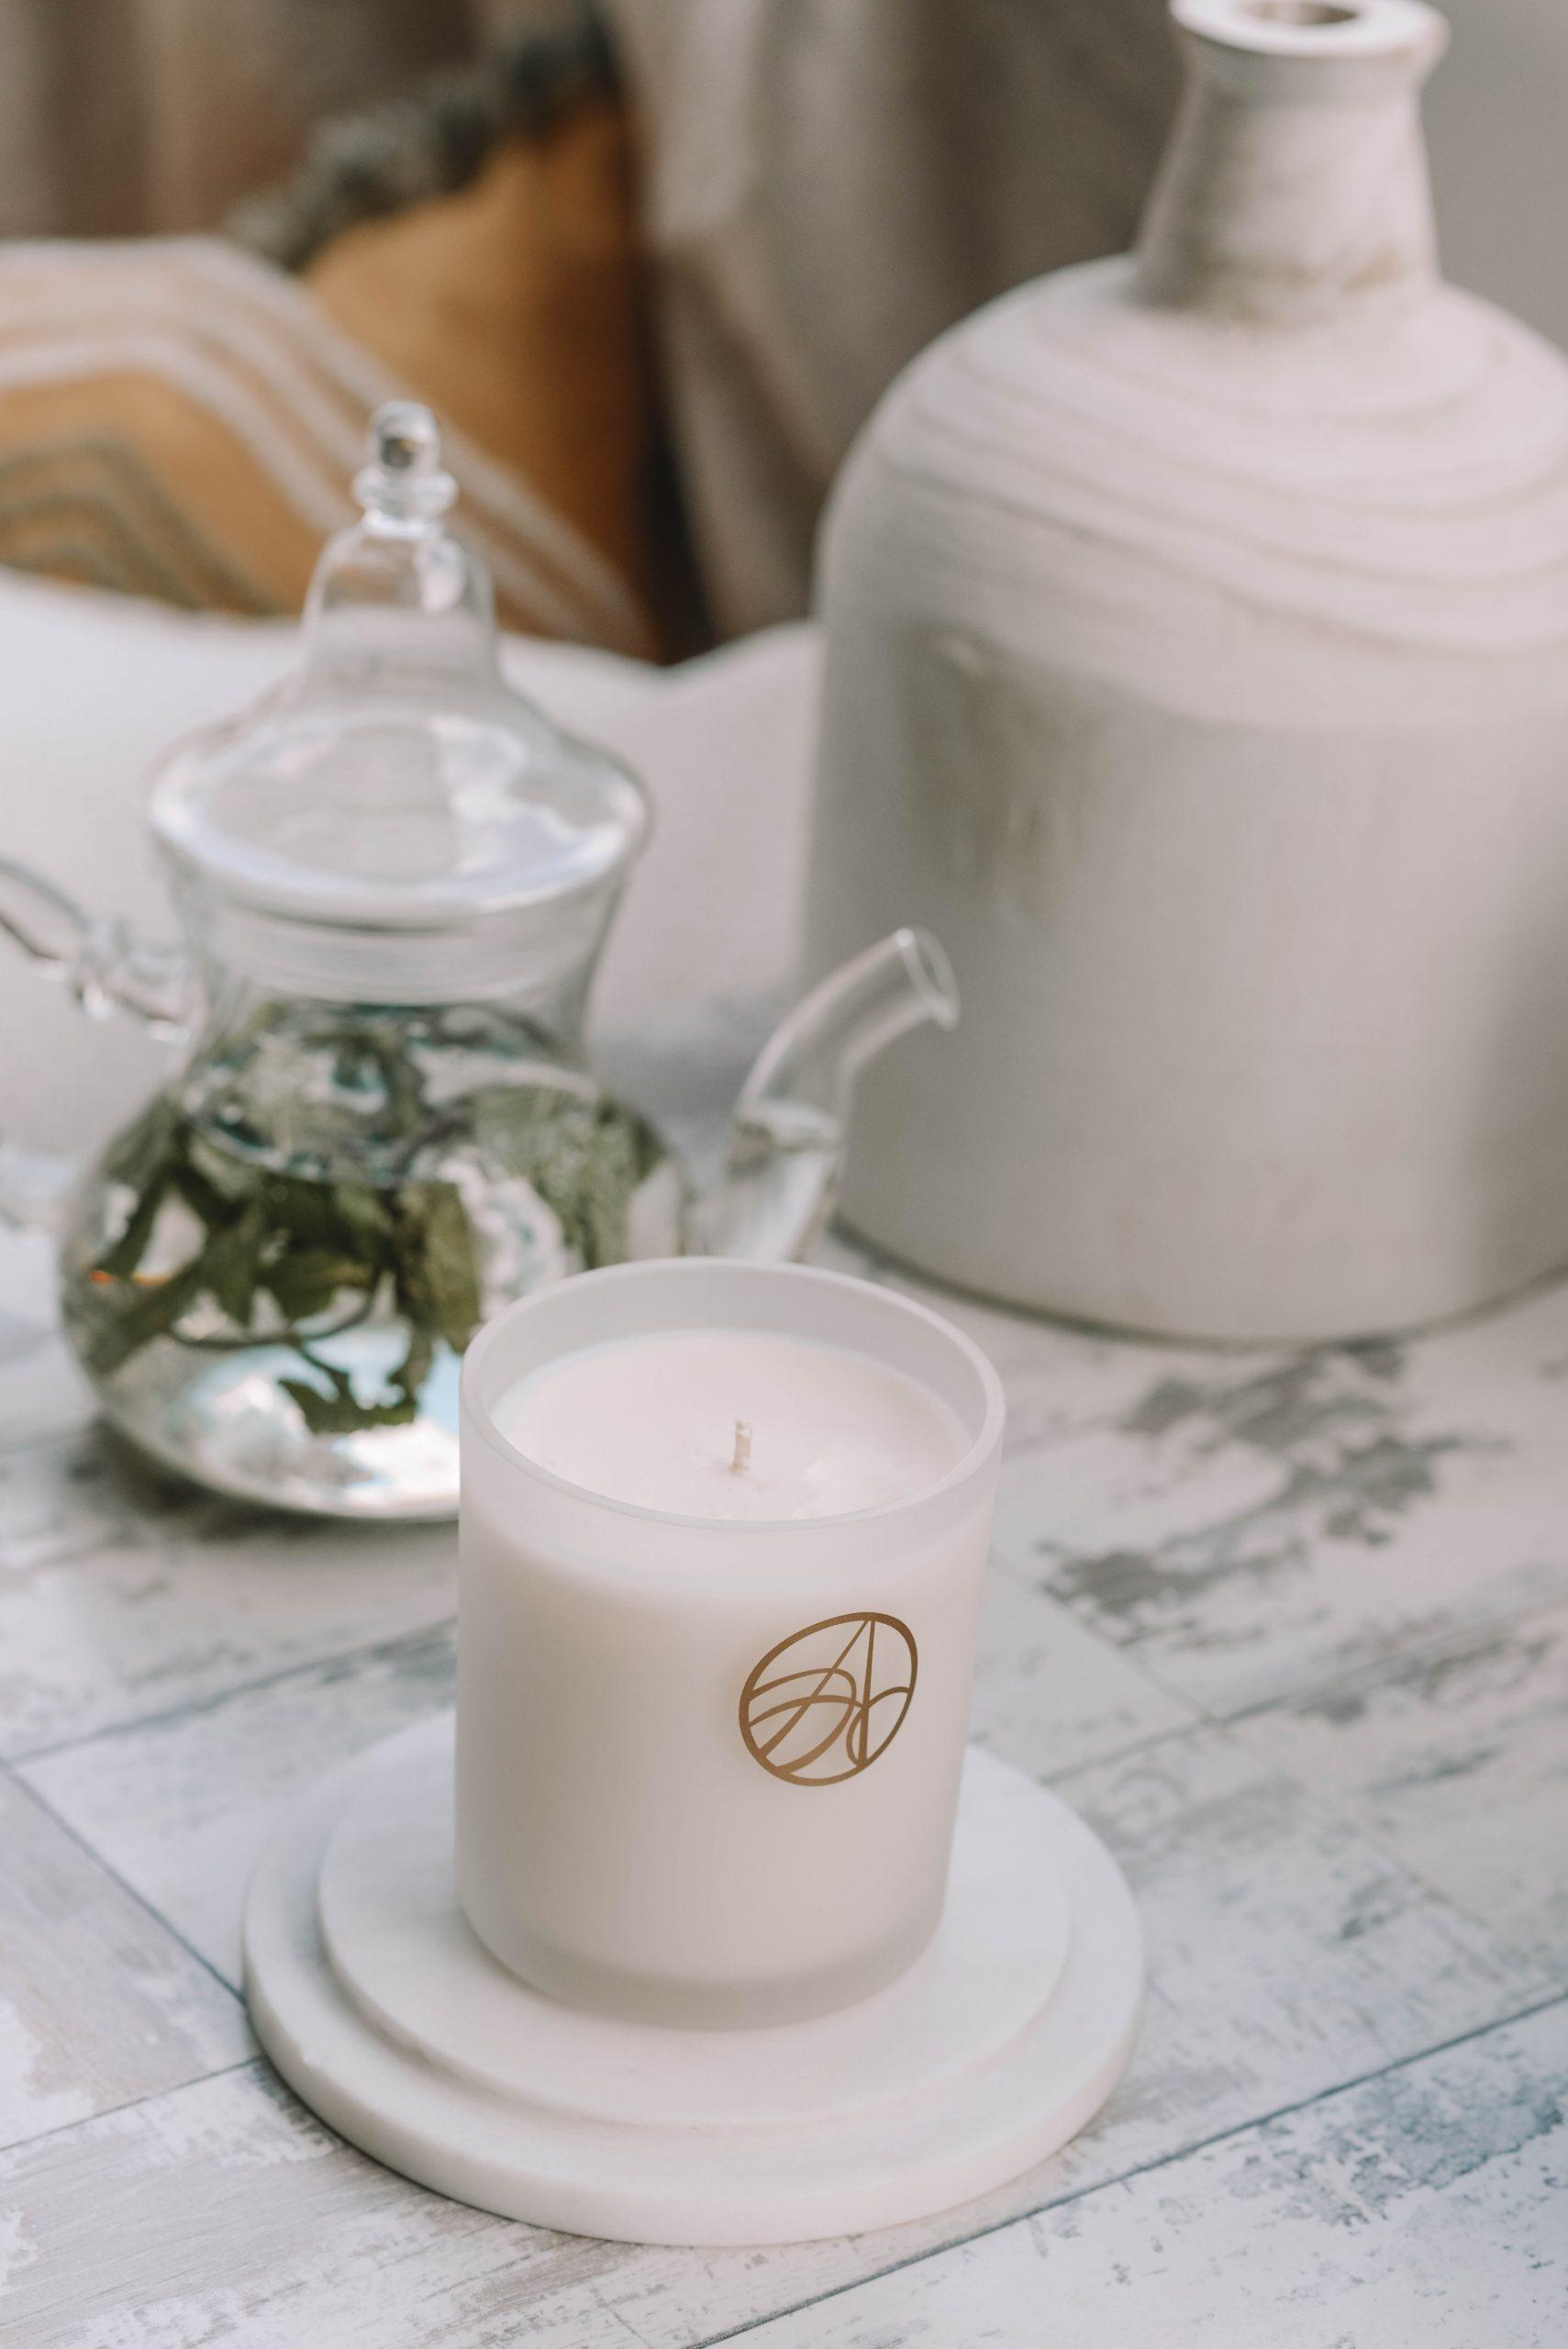 Moroccan Tea House Travel Through Scent